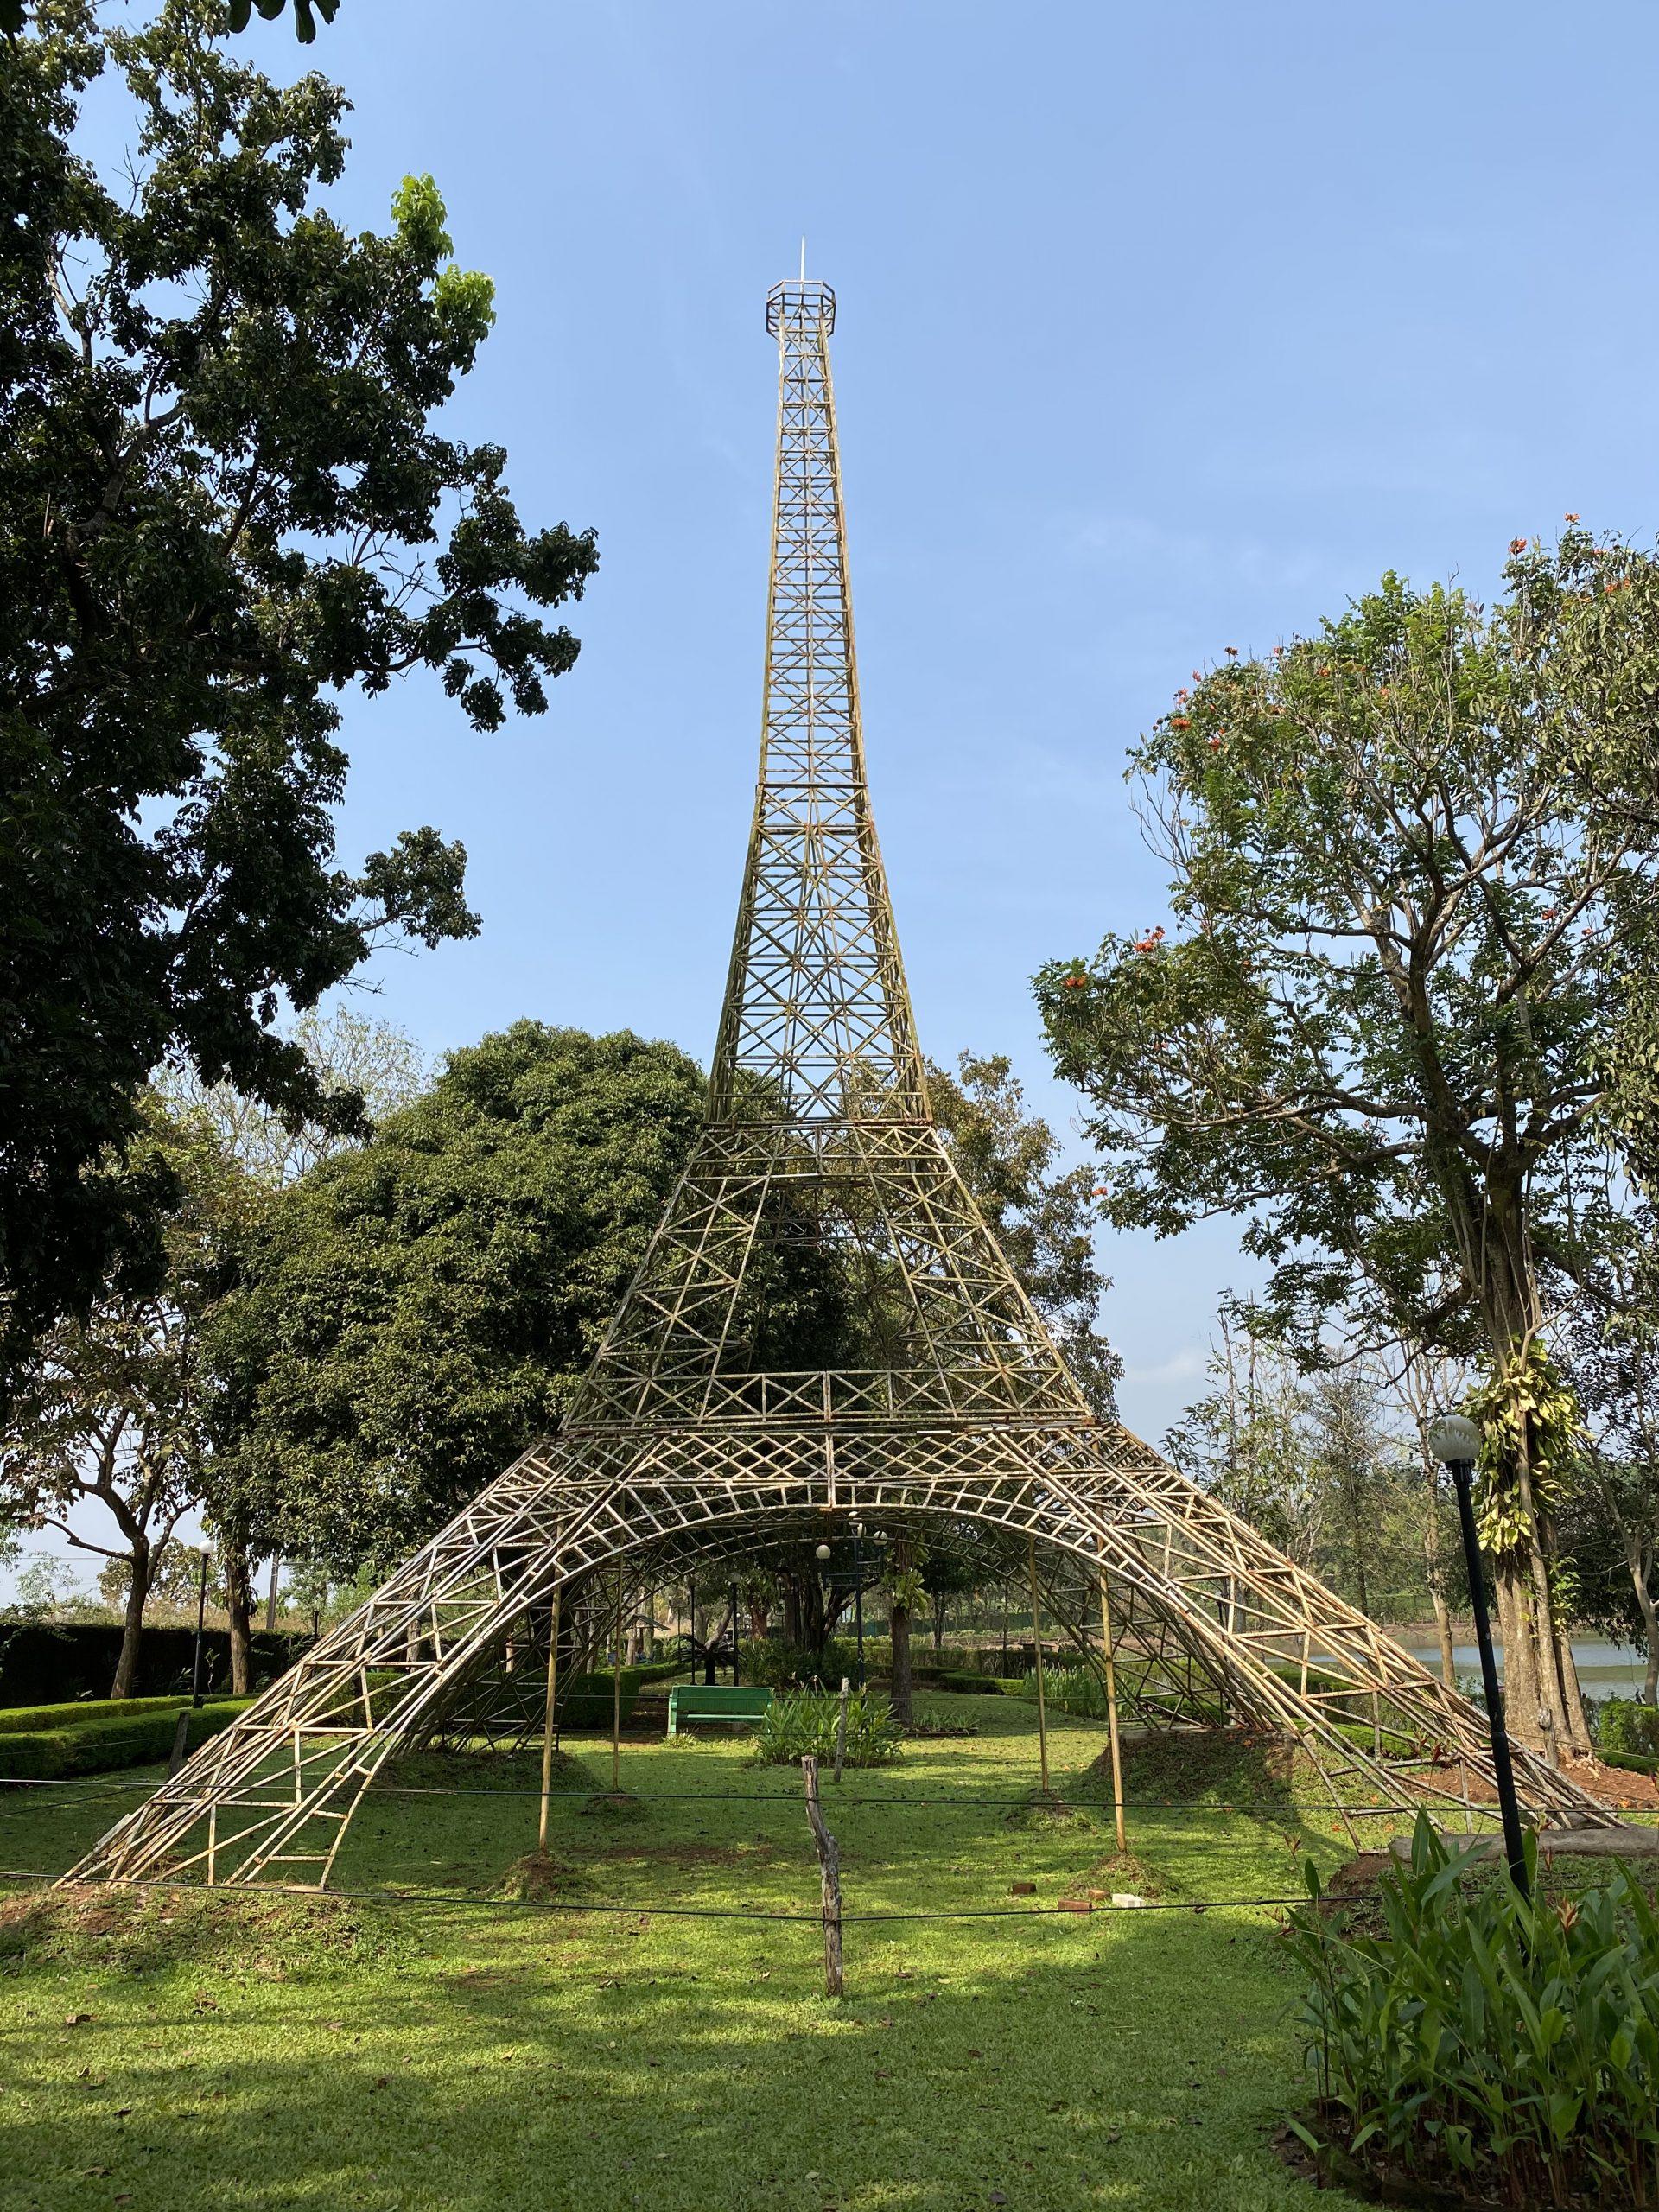 Eiffel Tower in a Park